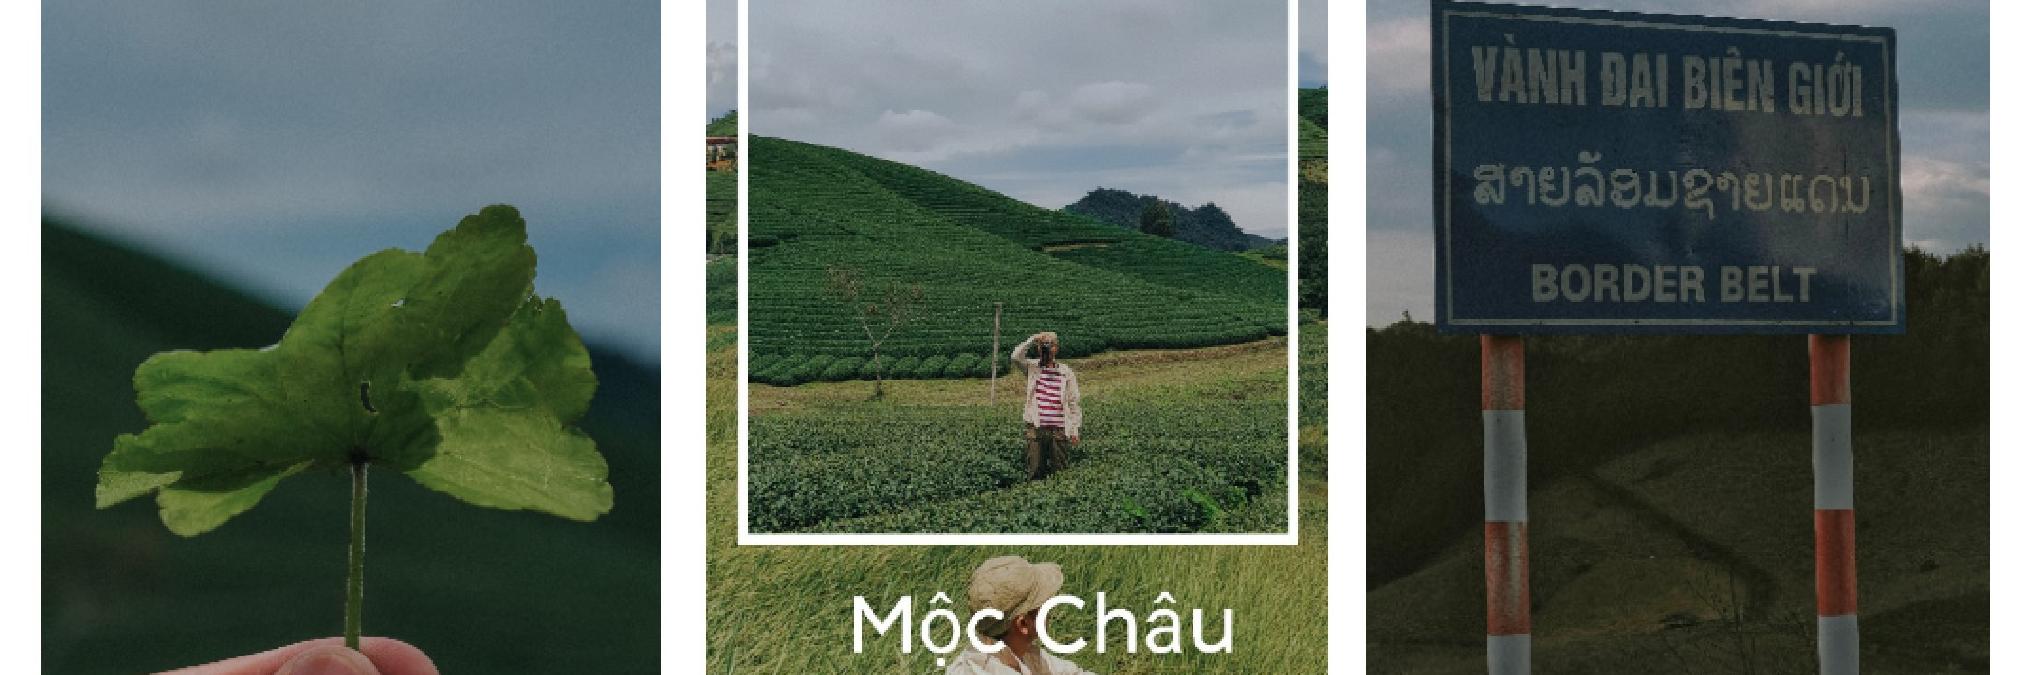 https://gody.vn/blog/tuananhhunre9193/post/moc-chau-ngay-nang-xanh-7518